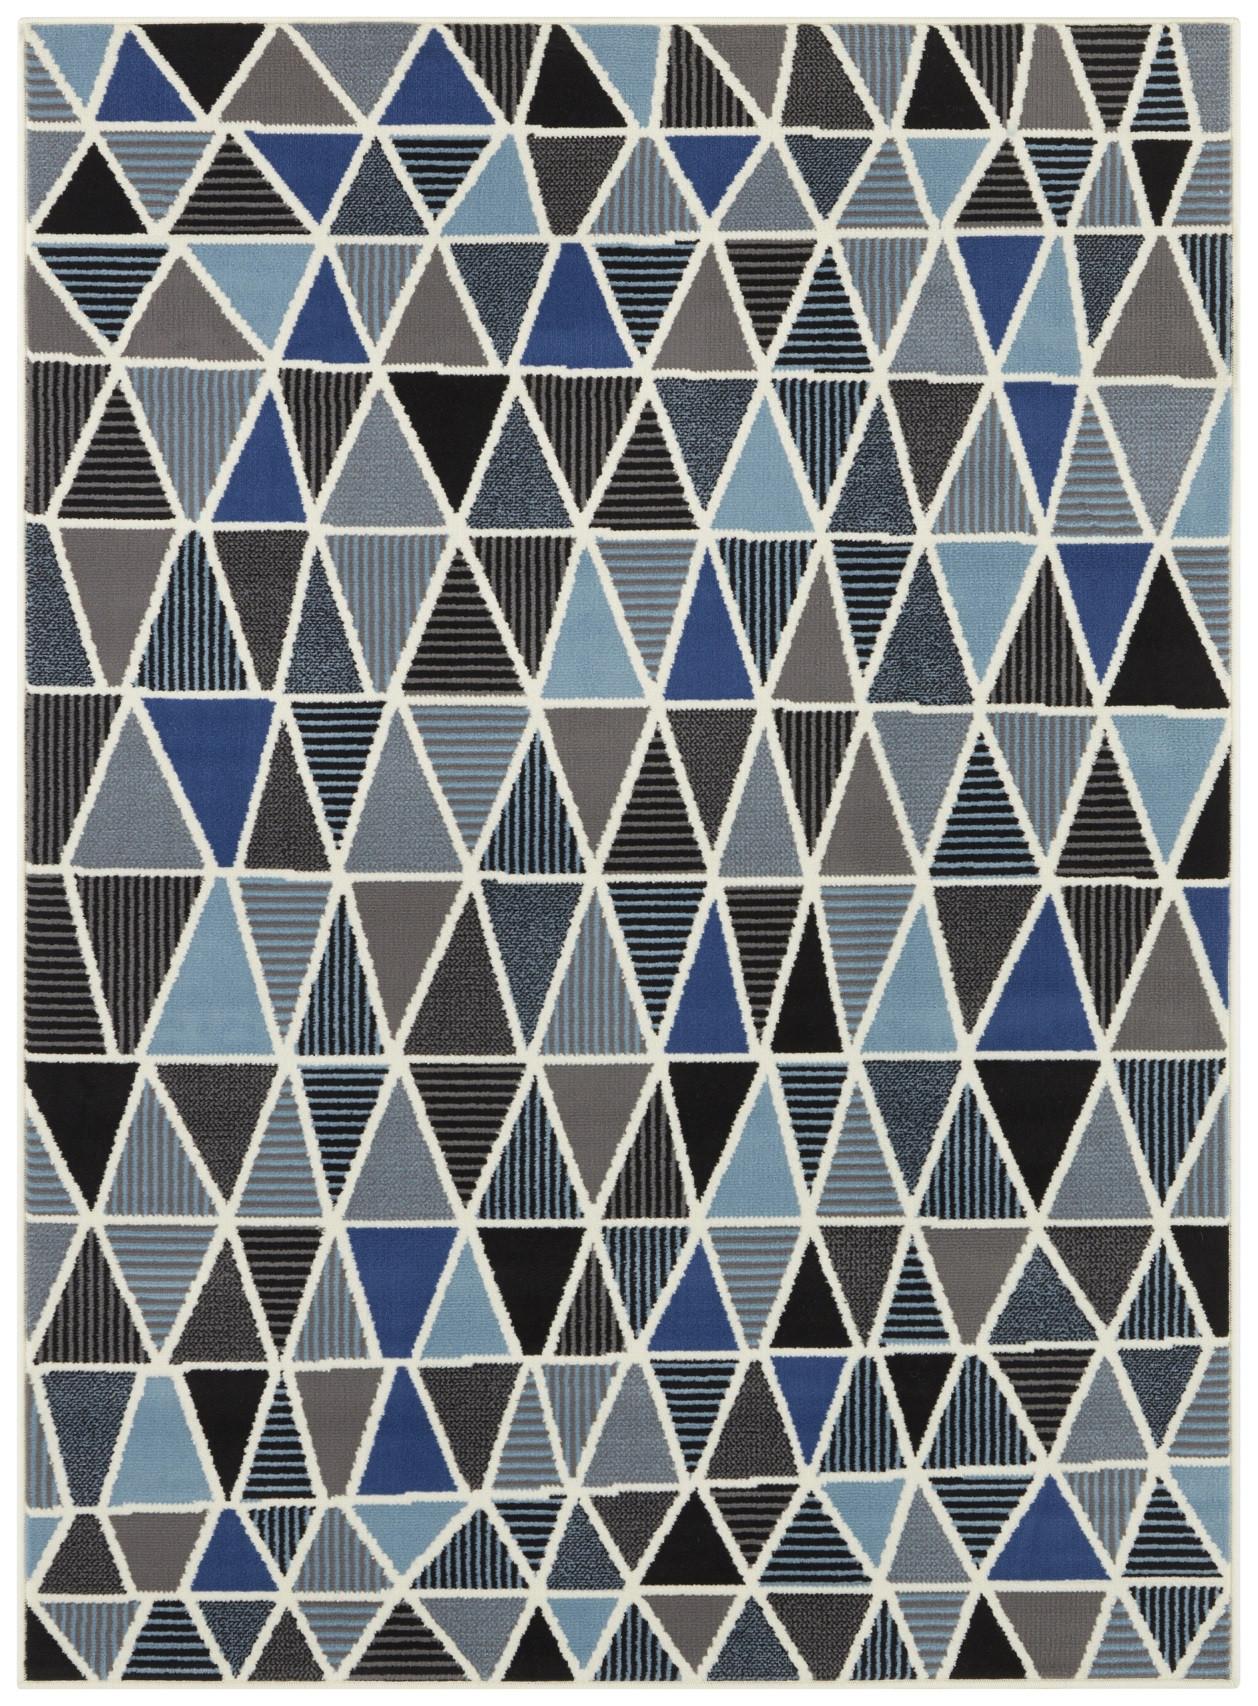 Levně Mujkoberec Original Kusový koberec Mujkoberec Original 104339 Cream/Blue - 180x260 cm Vícebarevná